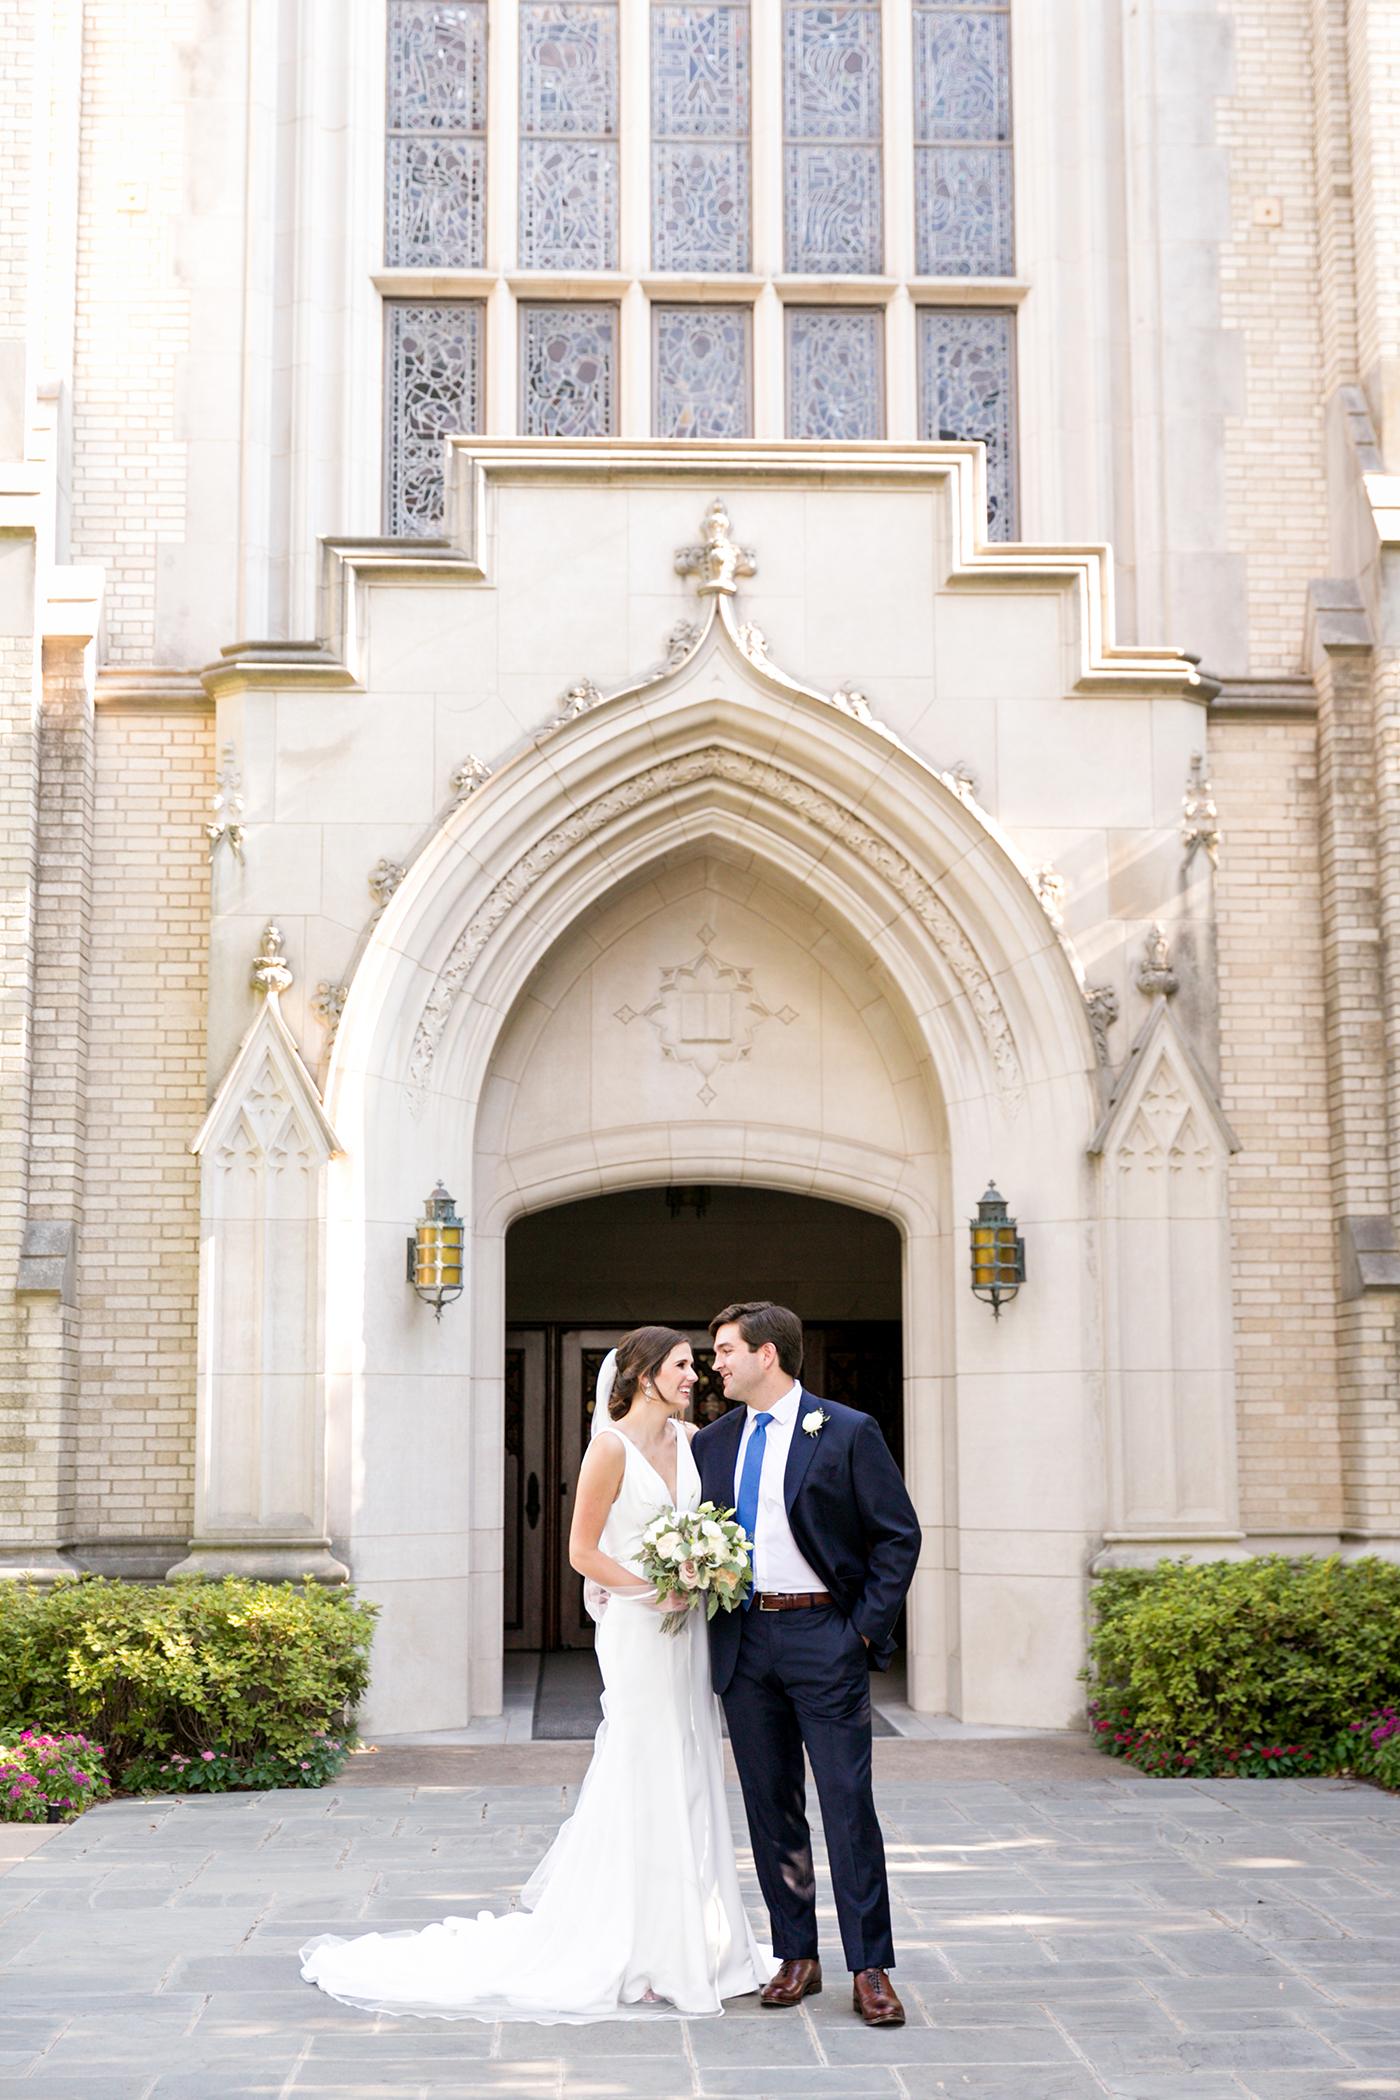 Wedding Planner Dallas TX - Allday Events - Highland Park - Marie Gabrielle Wedding - 253.jpg